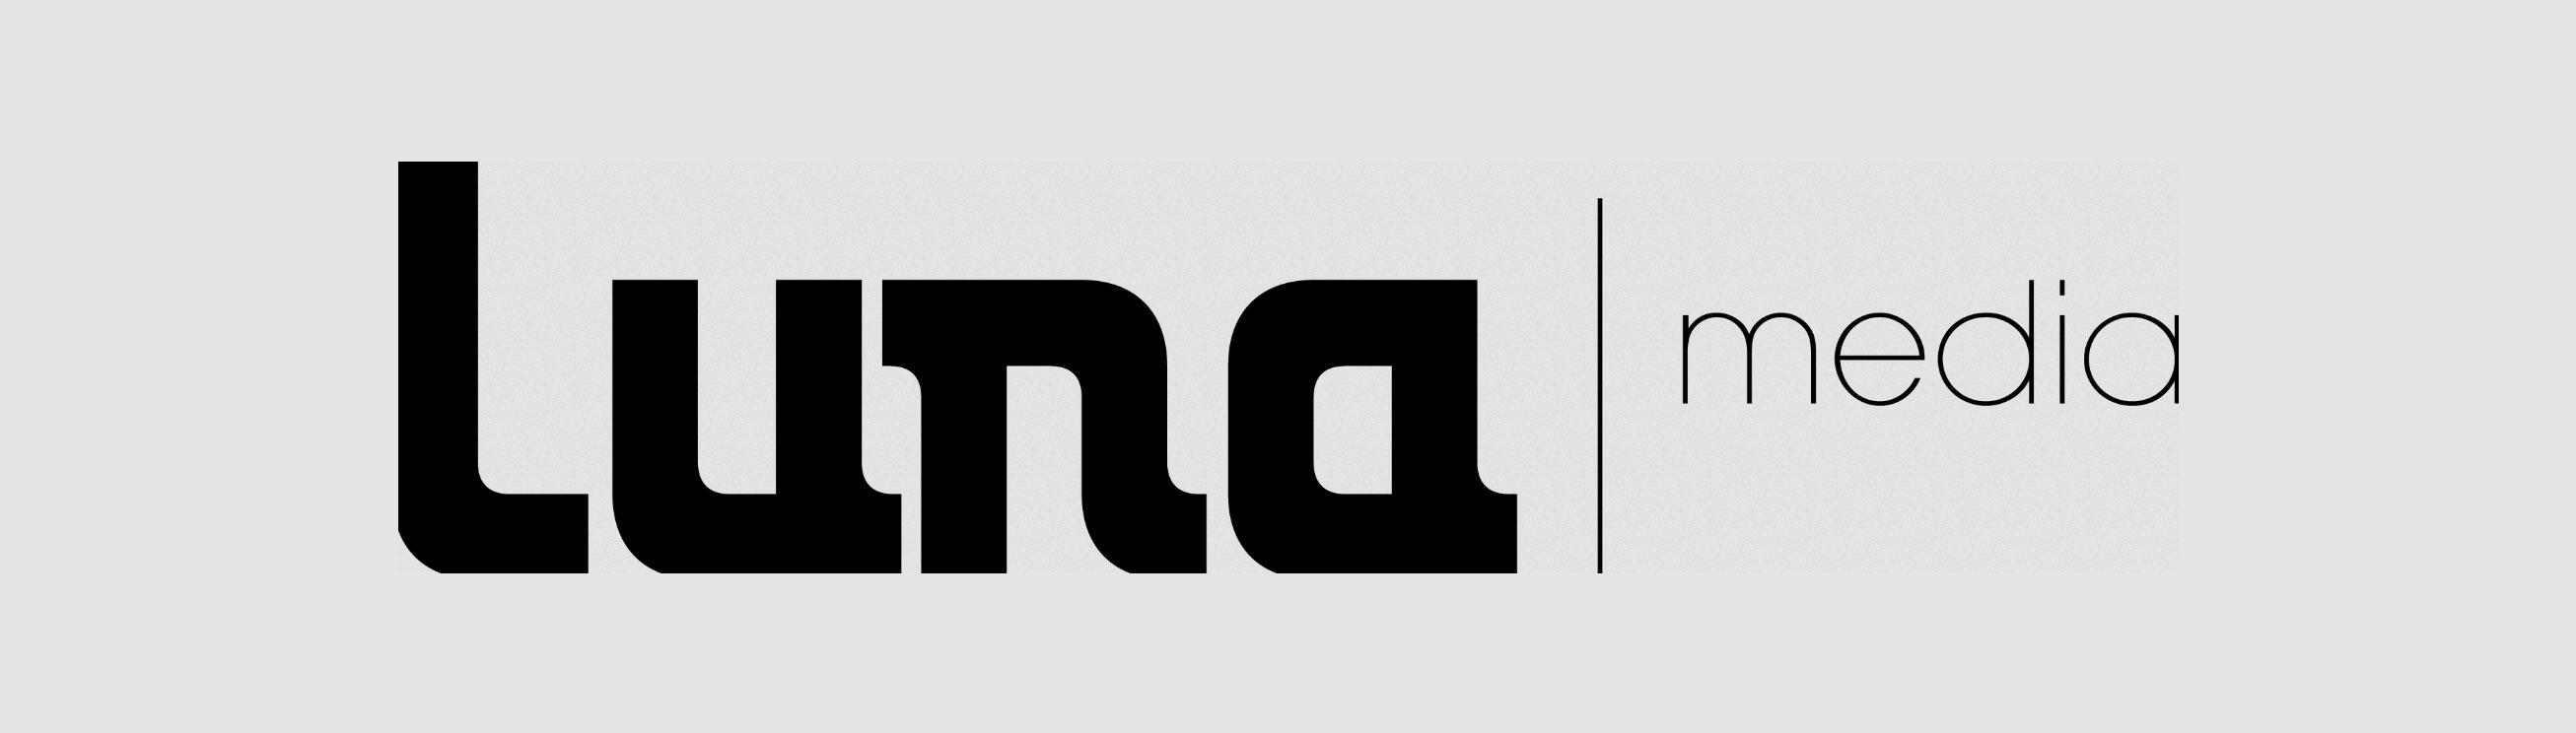 Logo Luna media Group - Luna familytainment GmbH